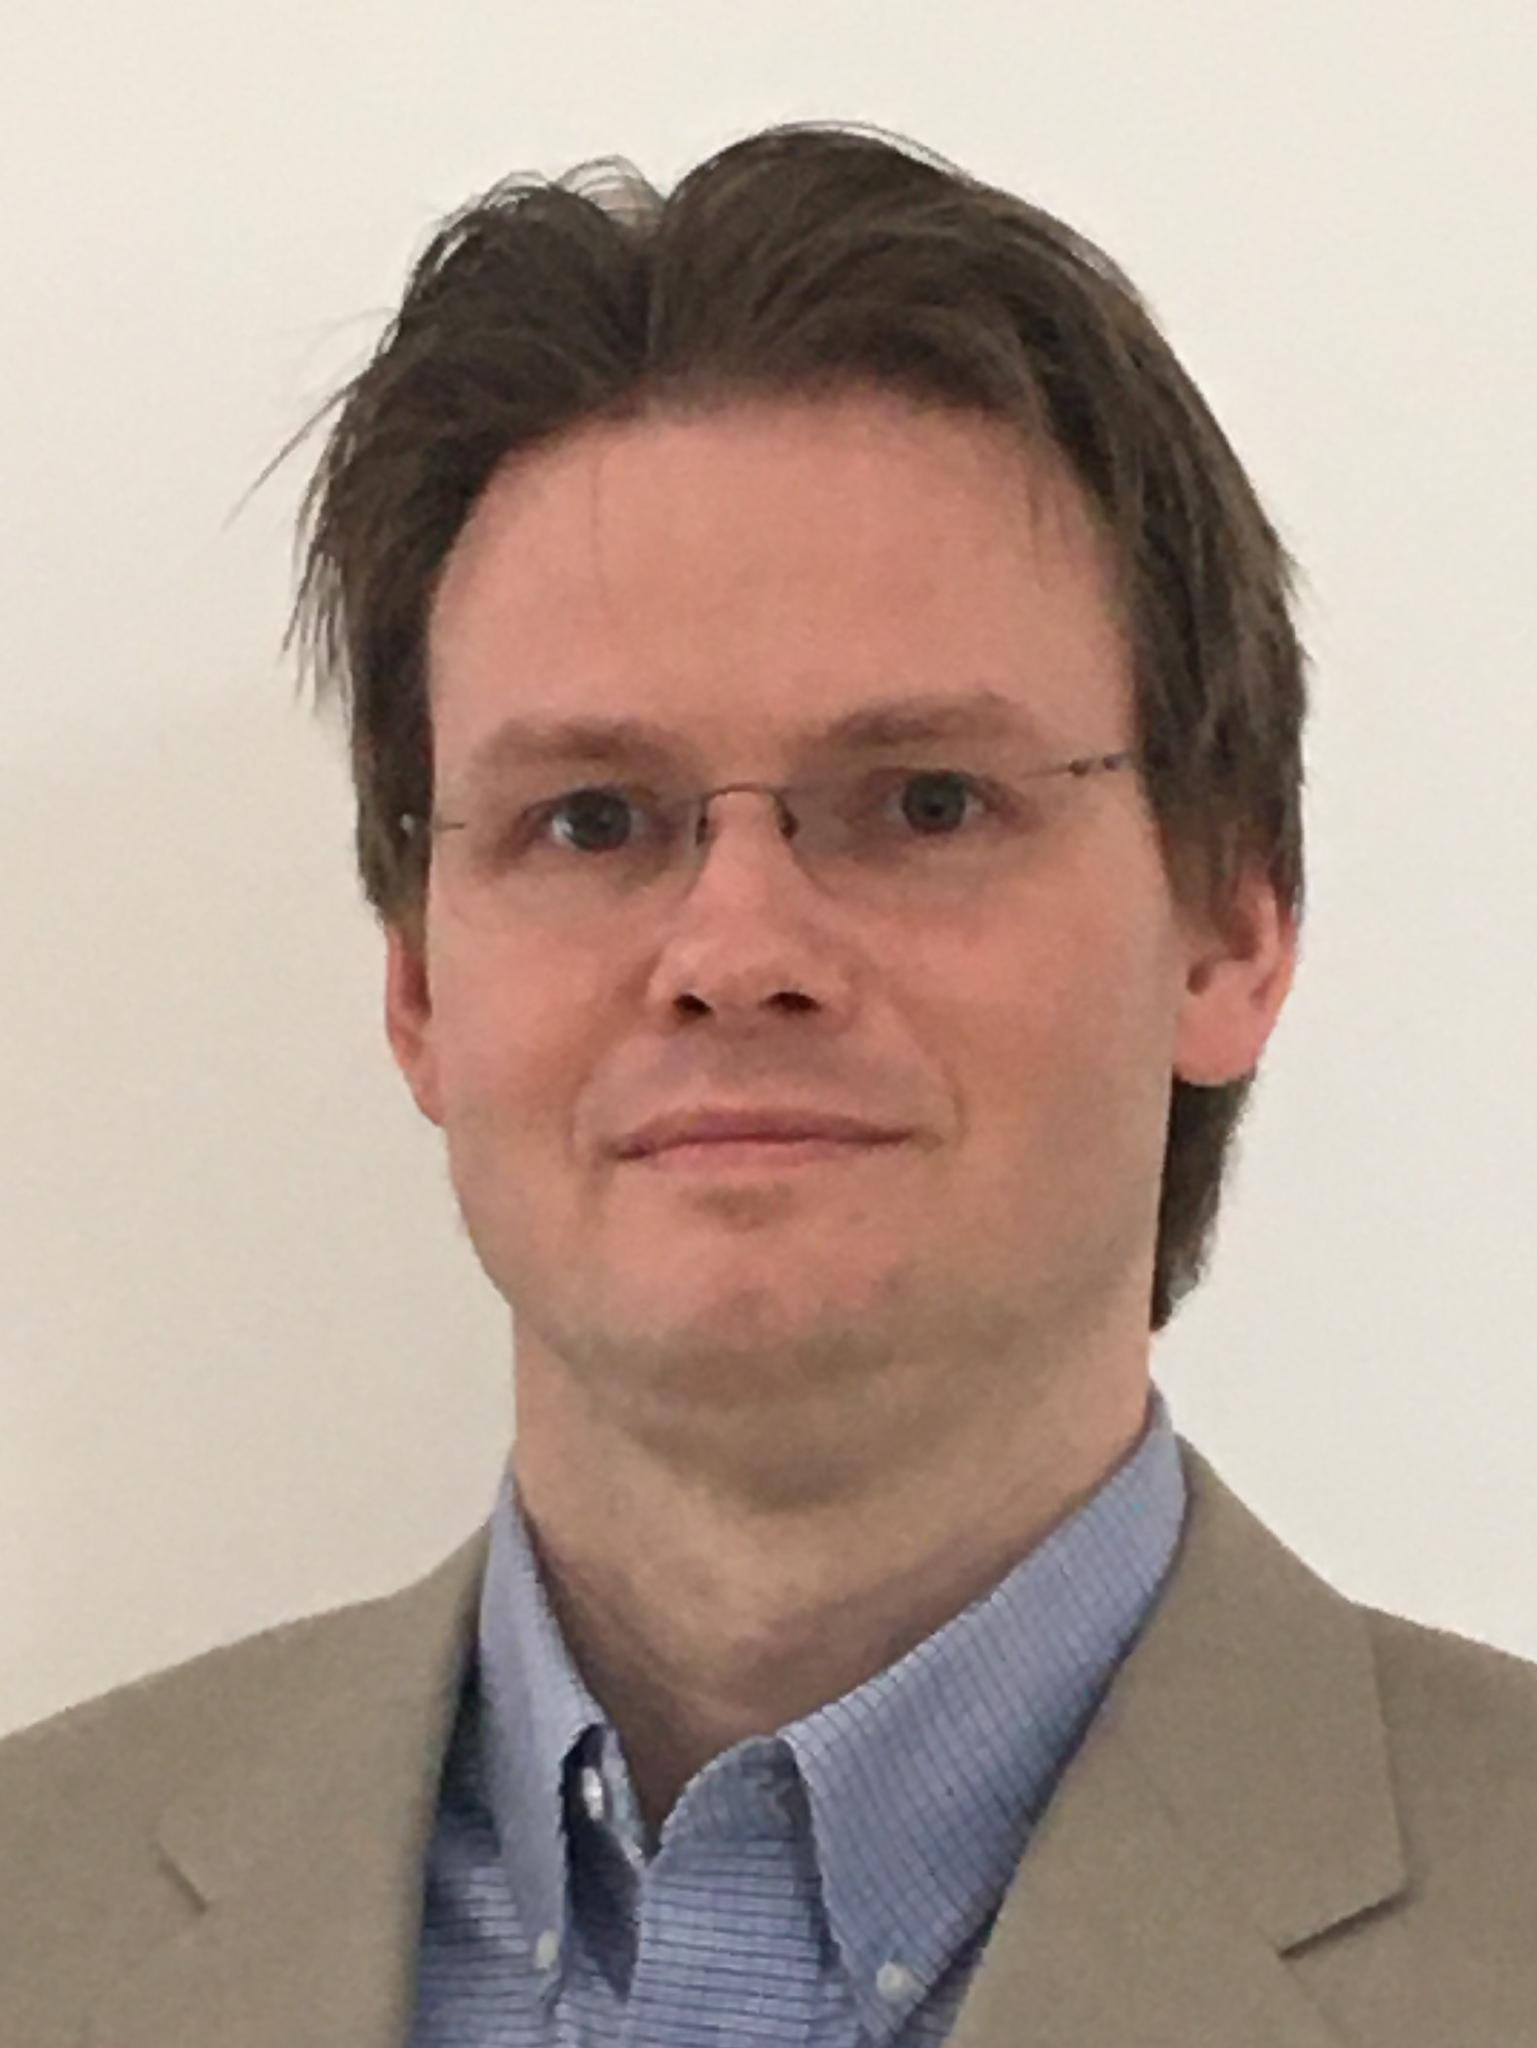 Martijn Bogaerts